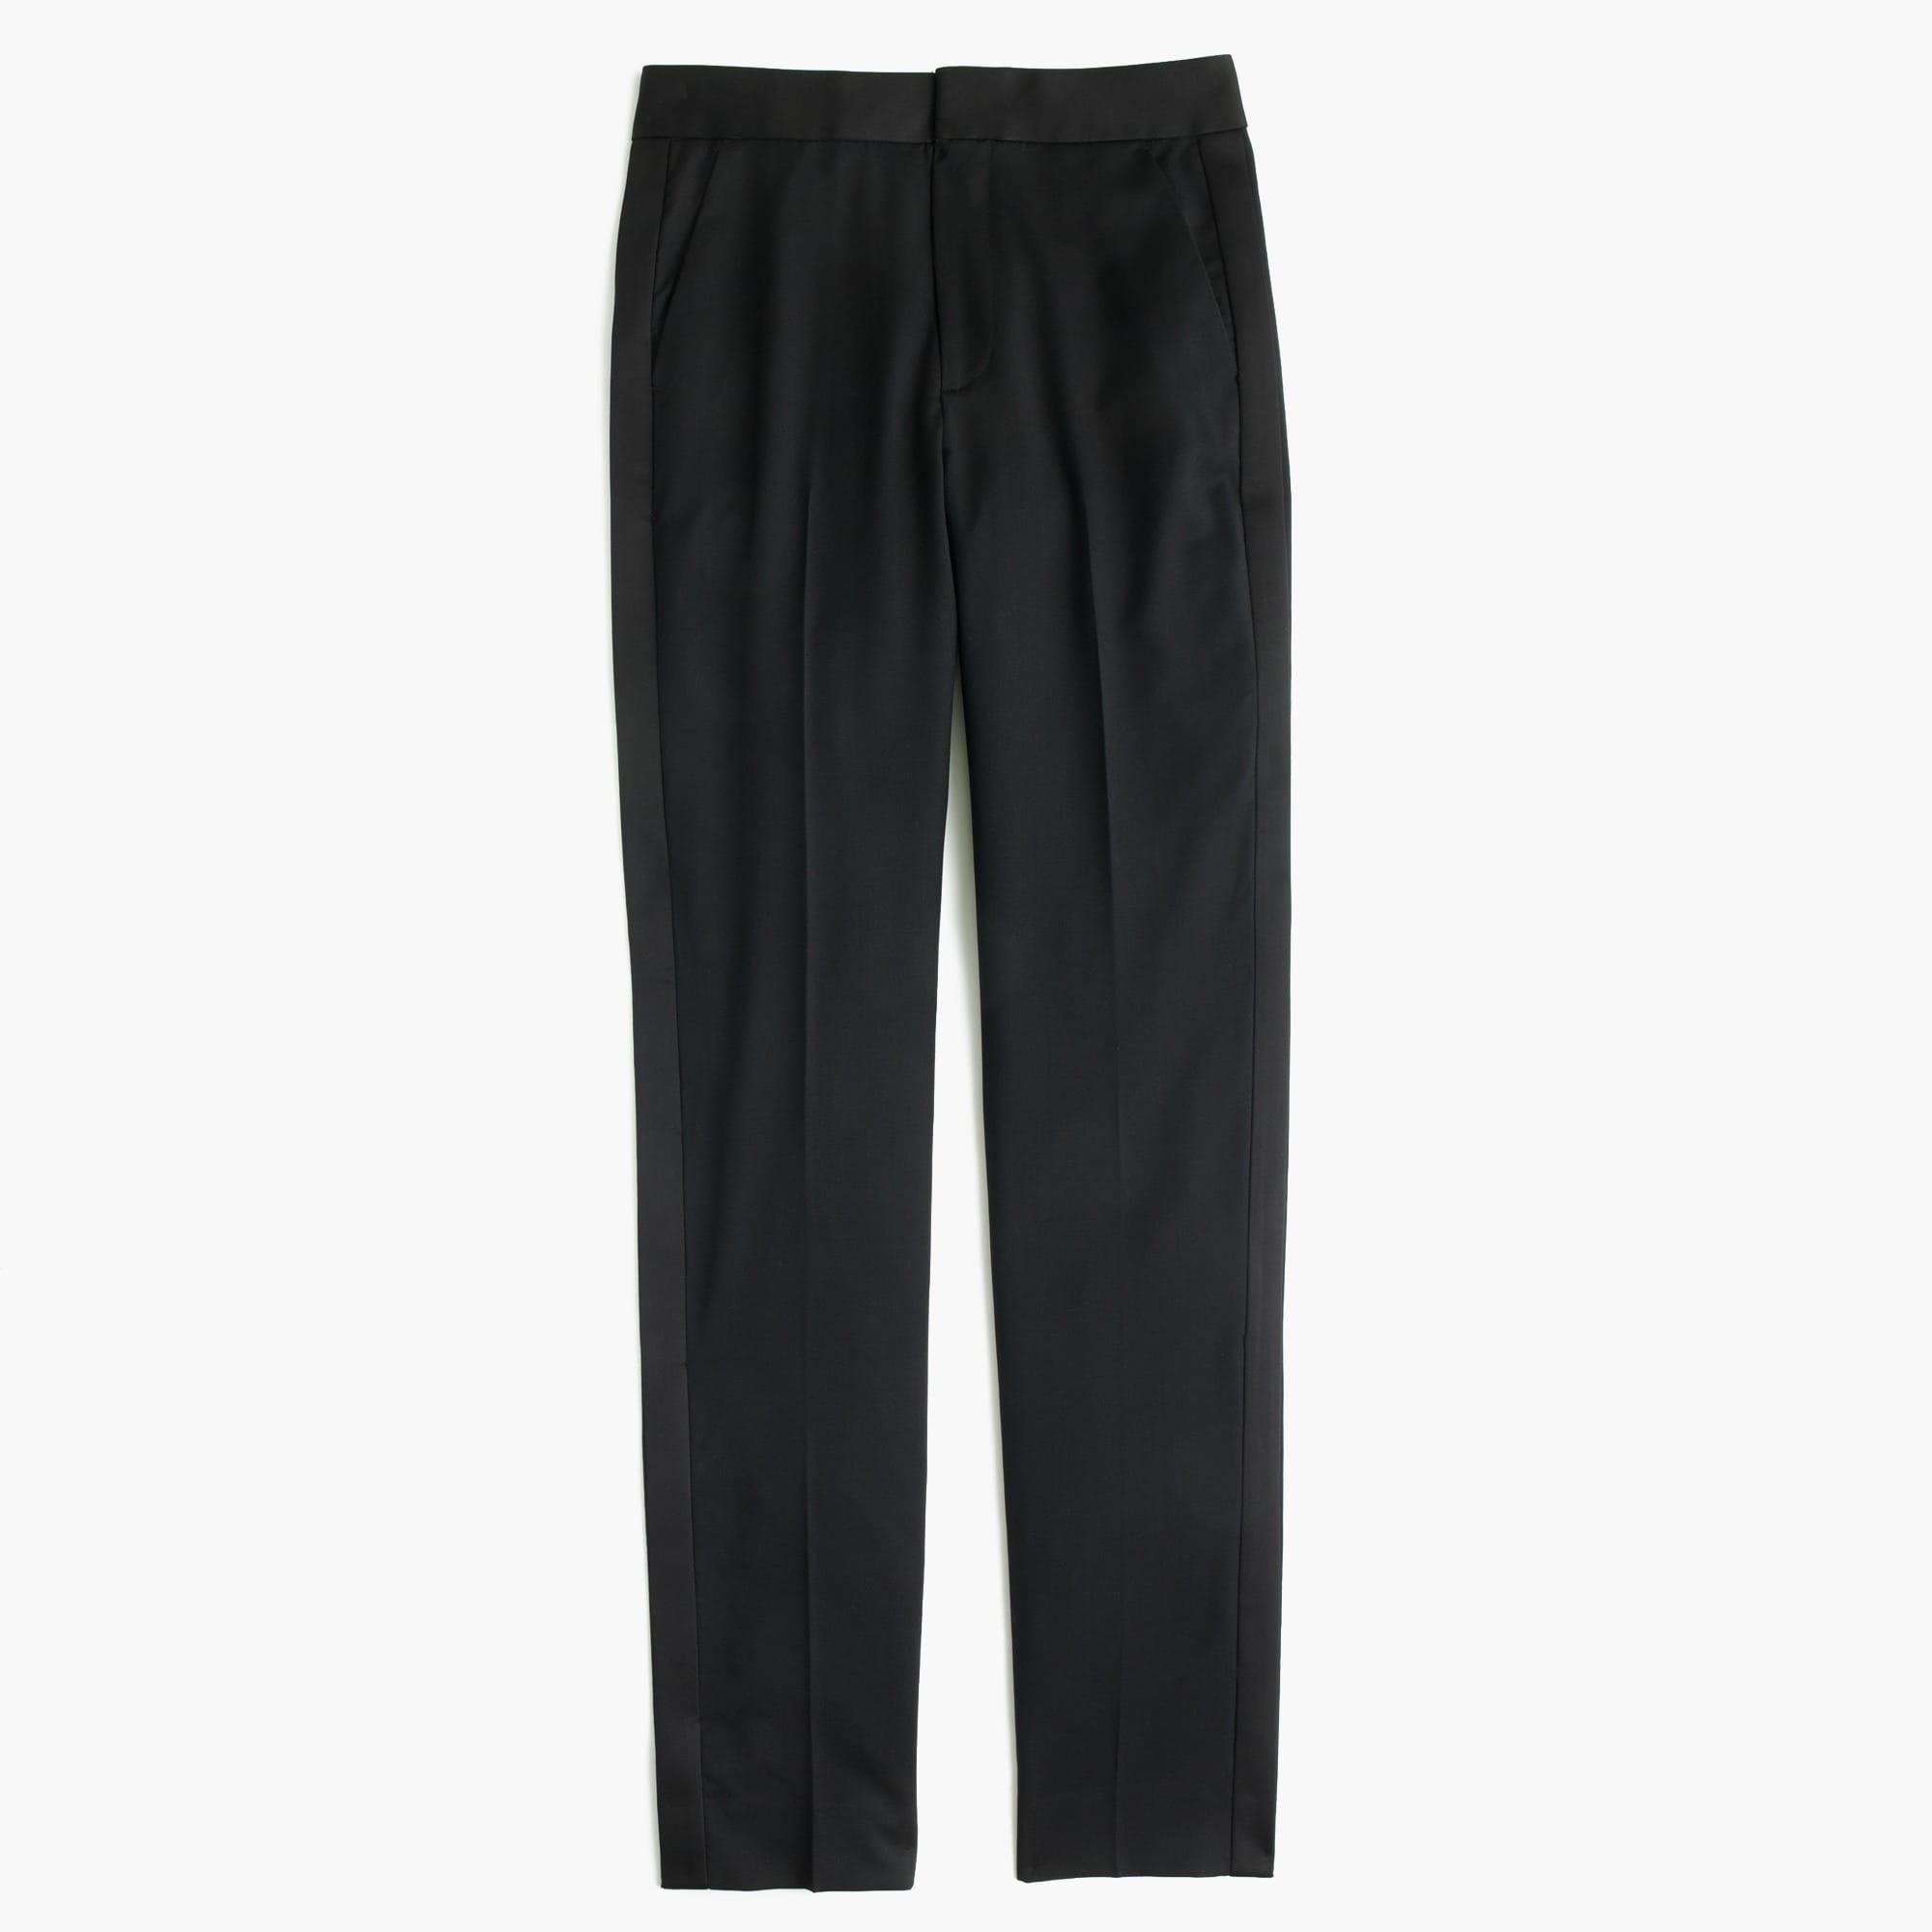 Collection tuxedo pant in Italian wool